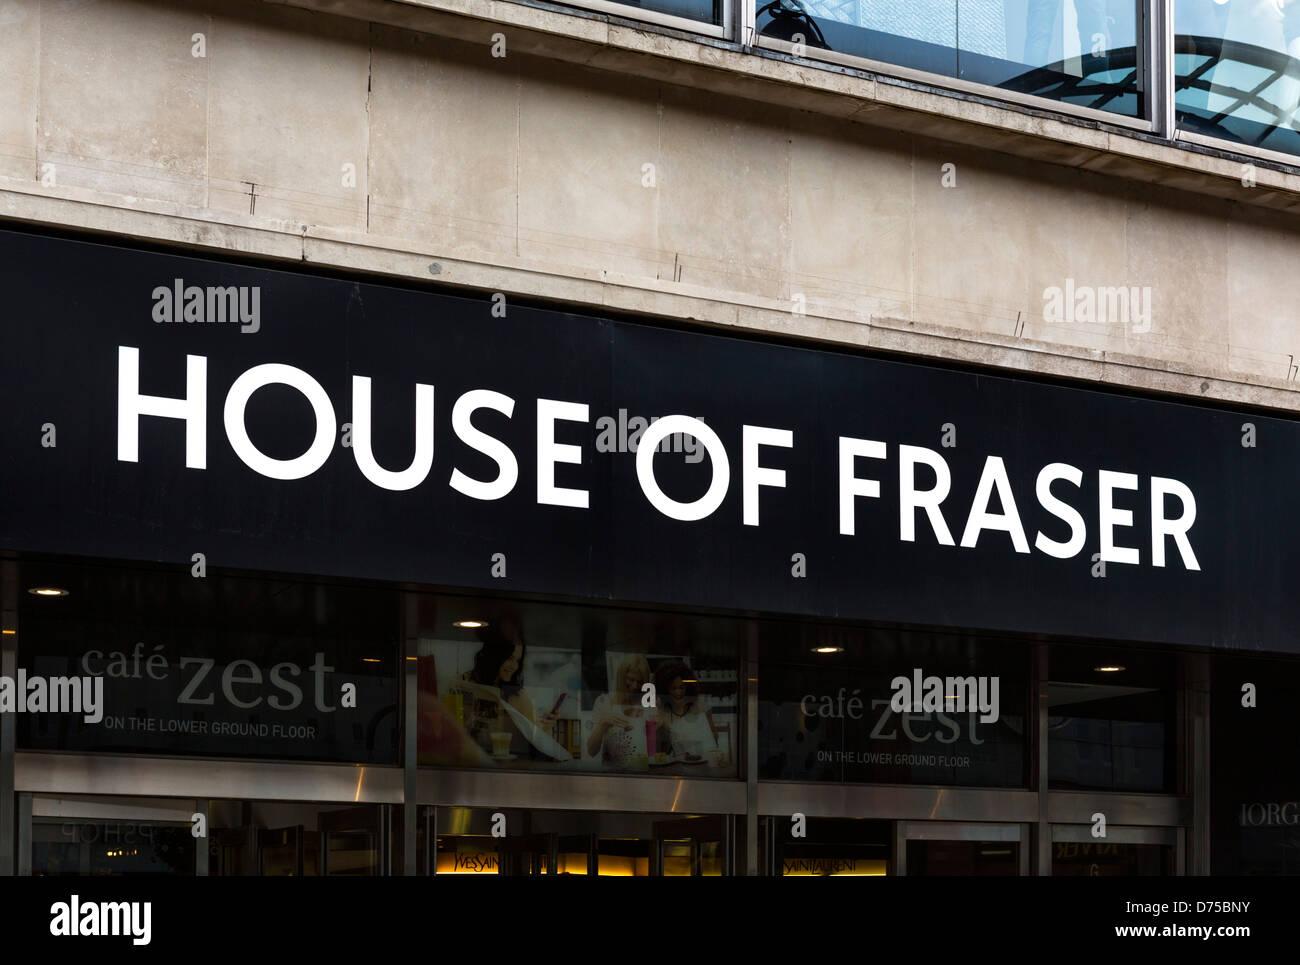 House of Fraser store on Briggate, Leeds, West Yorkshire, UK - Stock Image